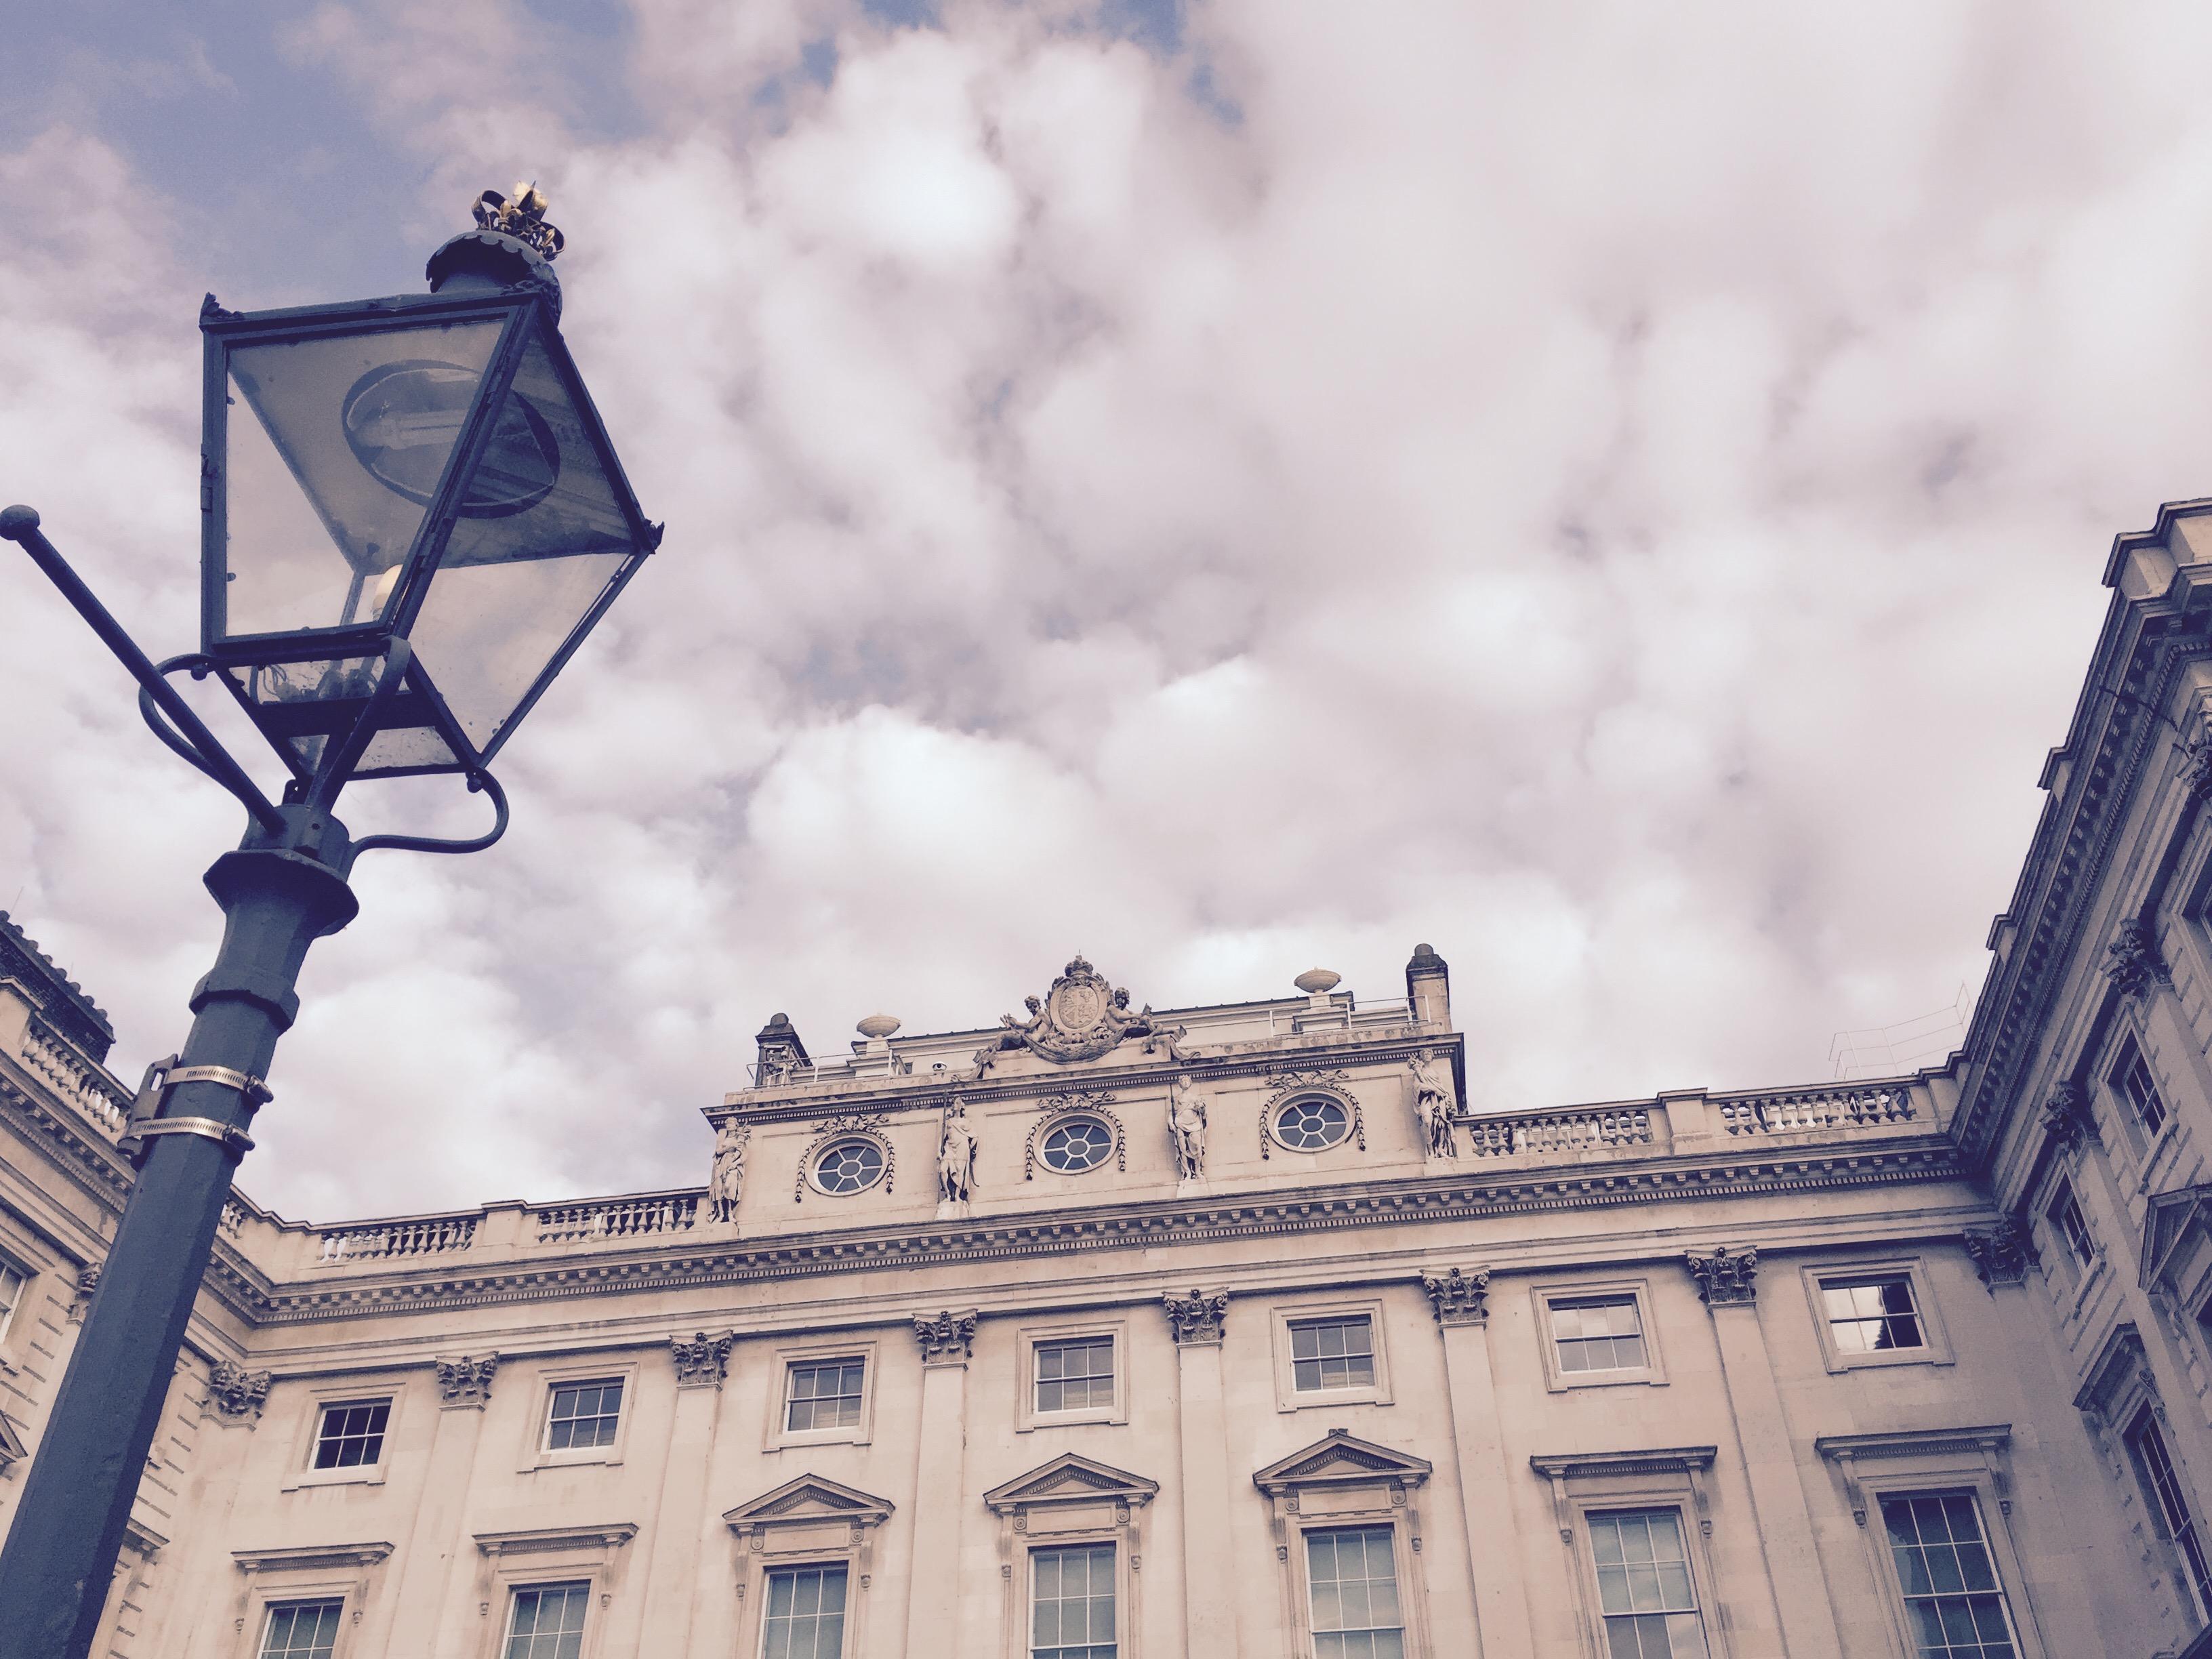 london-blackfriars-bridge-1-4